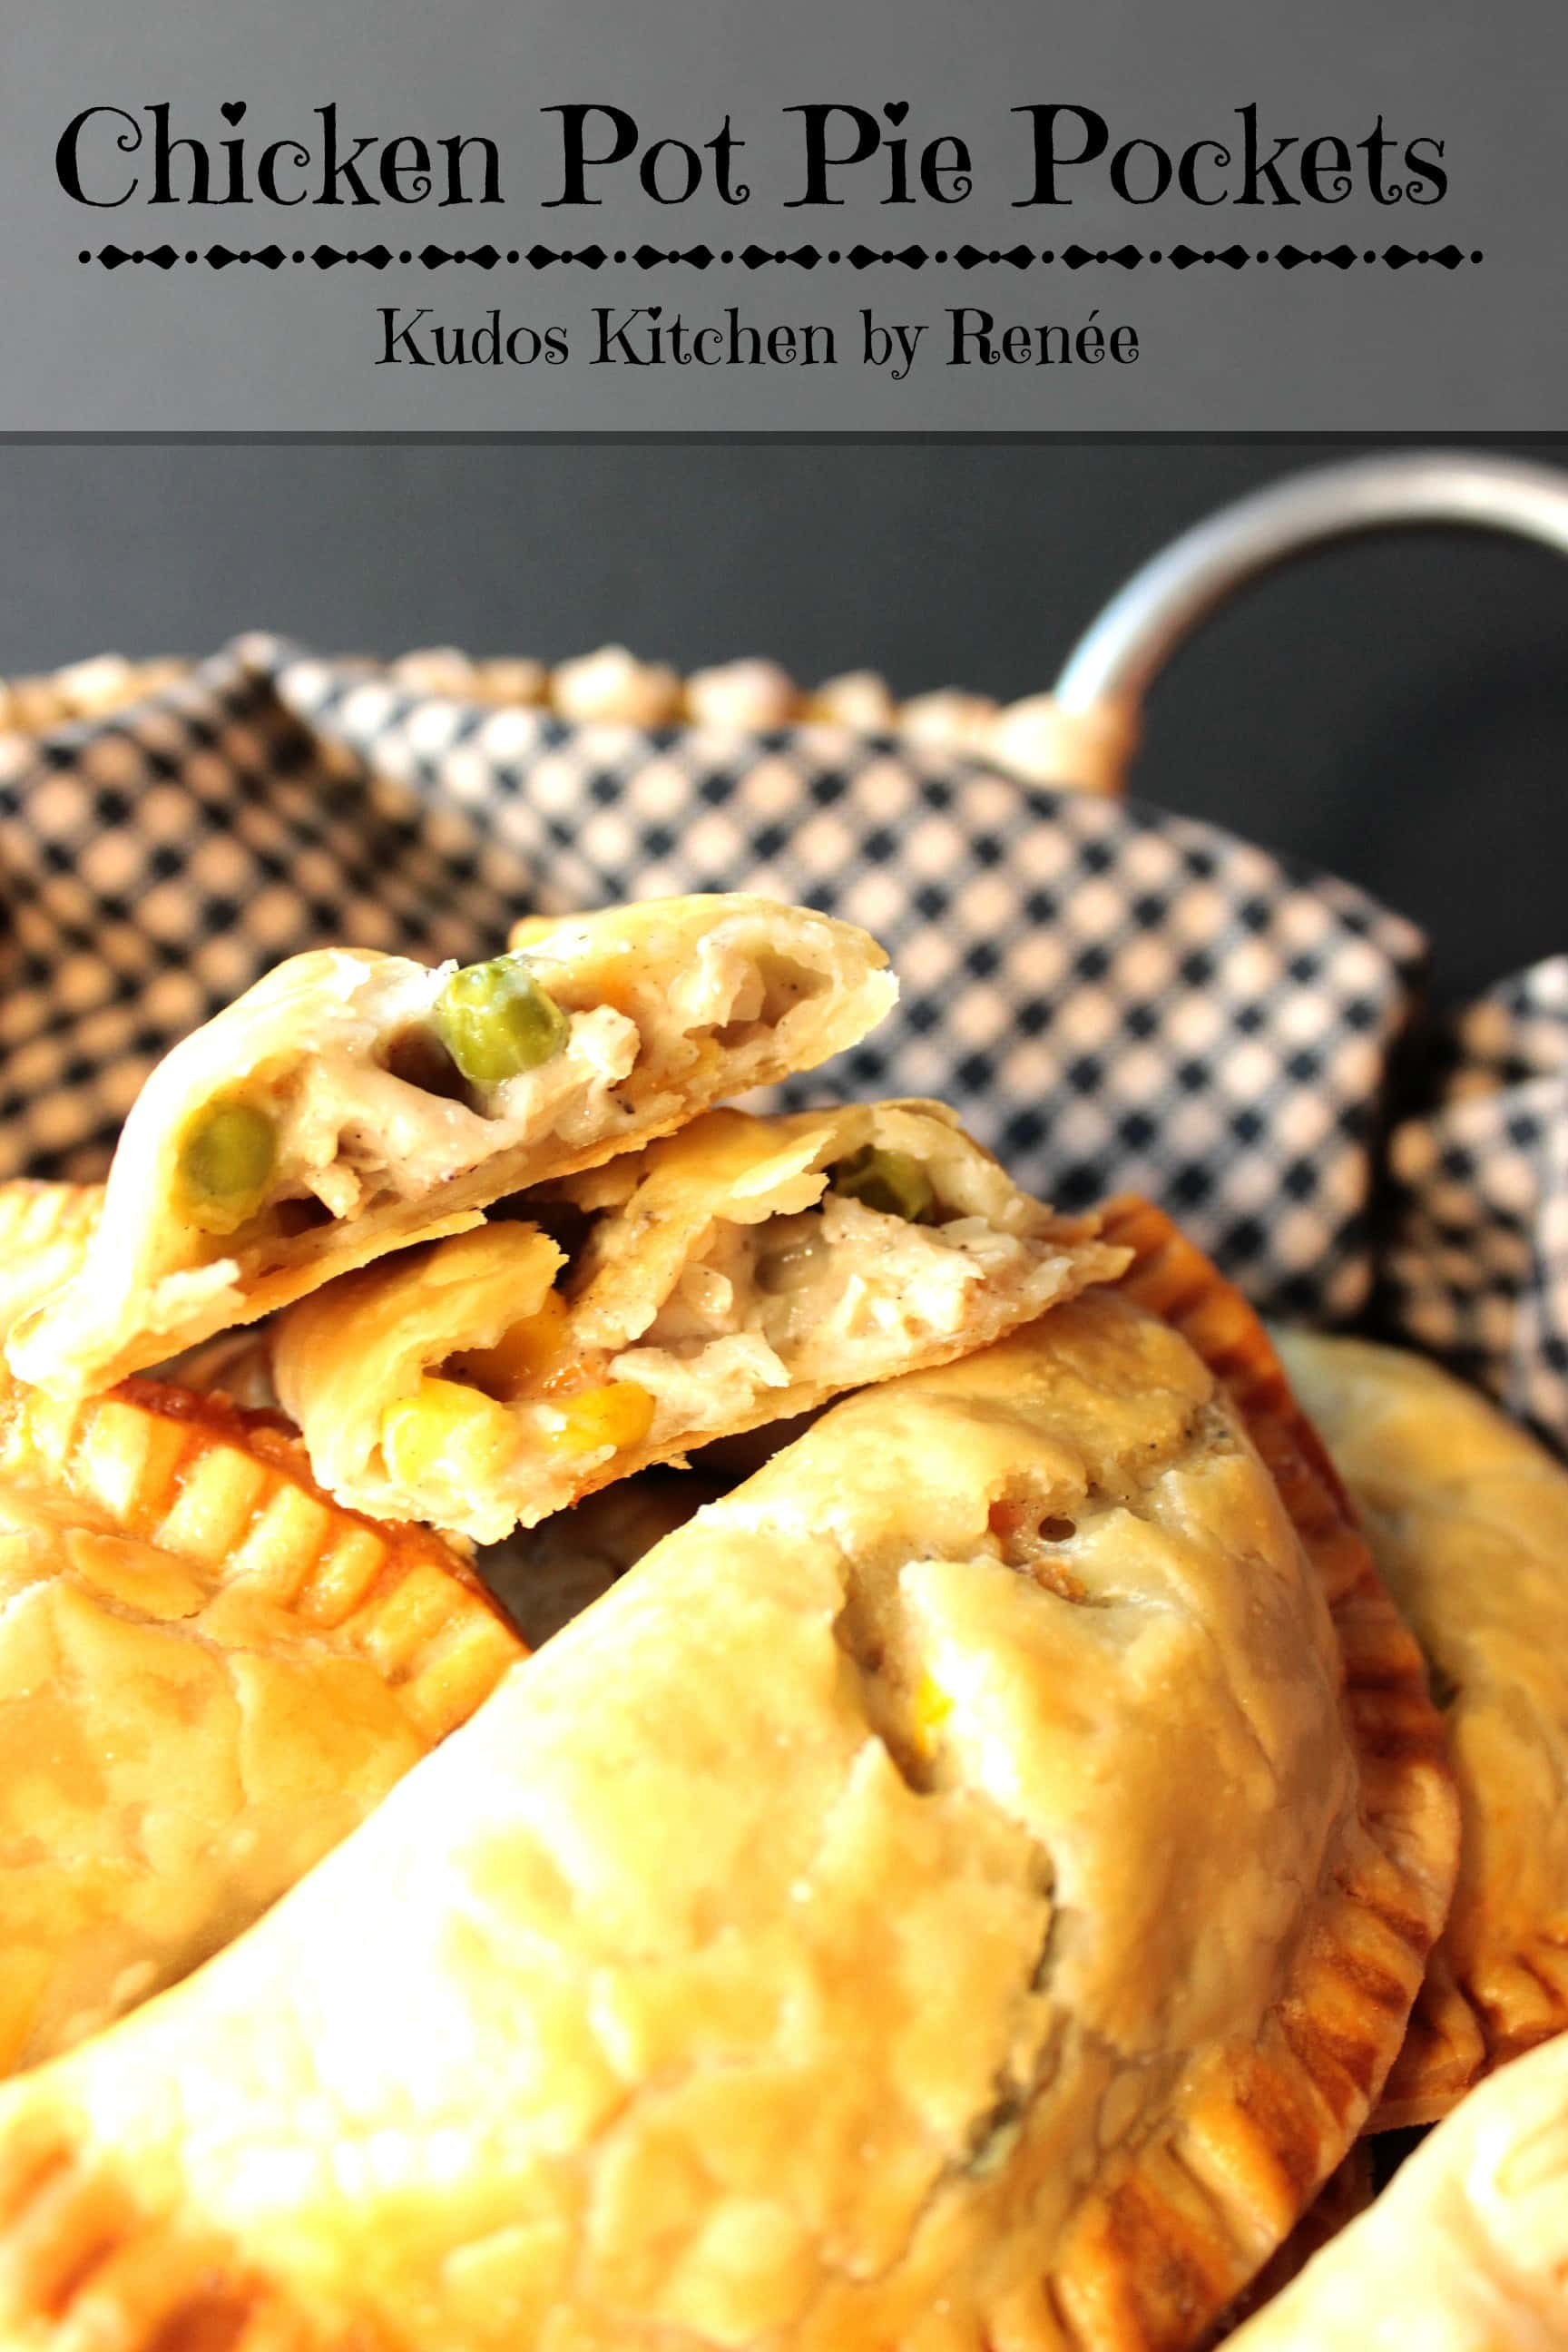 how to make pie crust for chicken pot pie